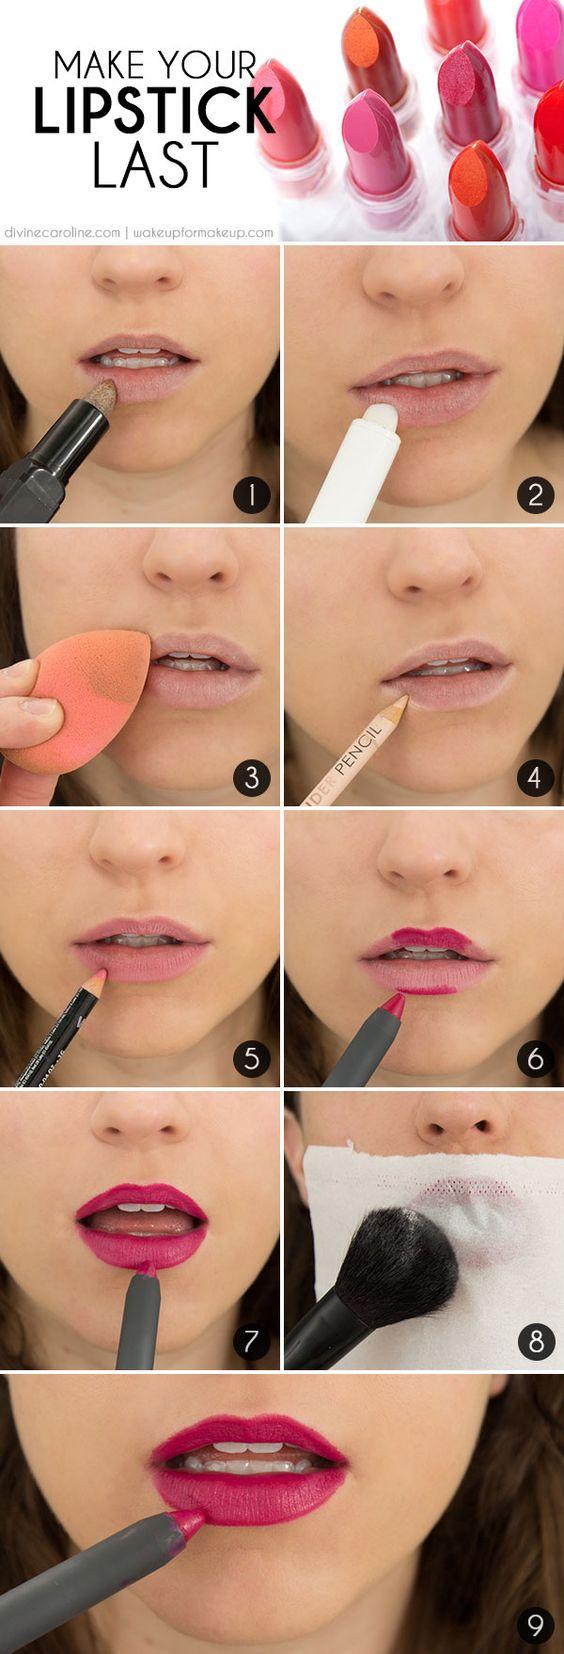 Last-long Lipsticks via